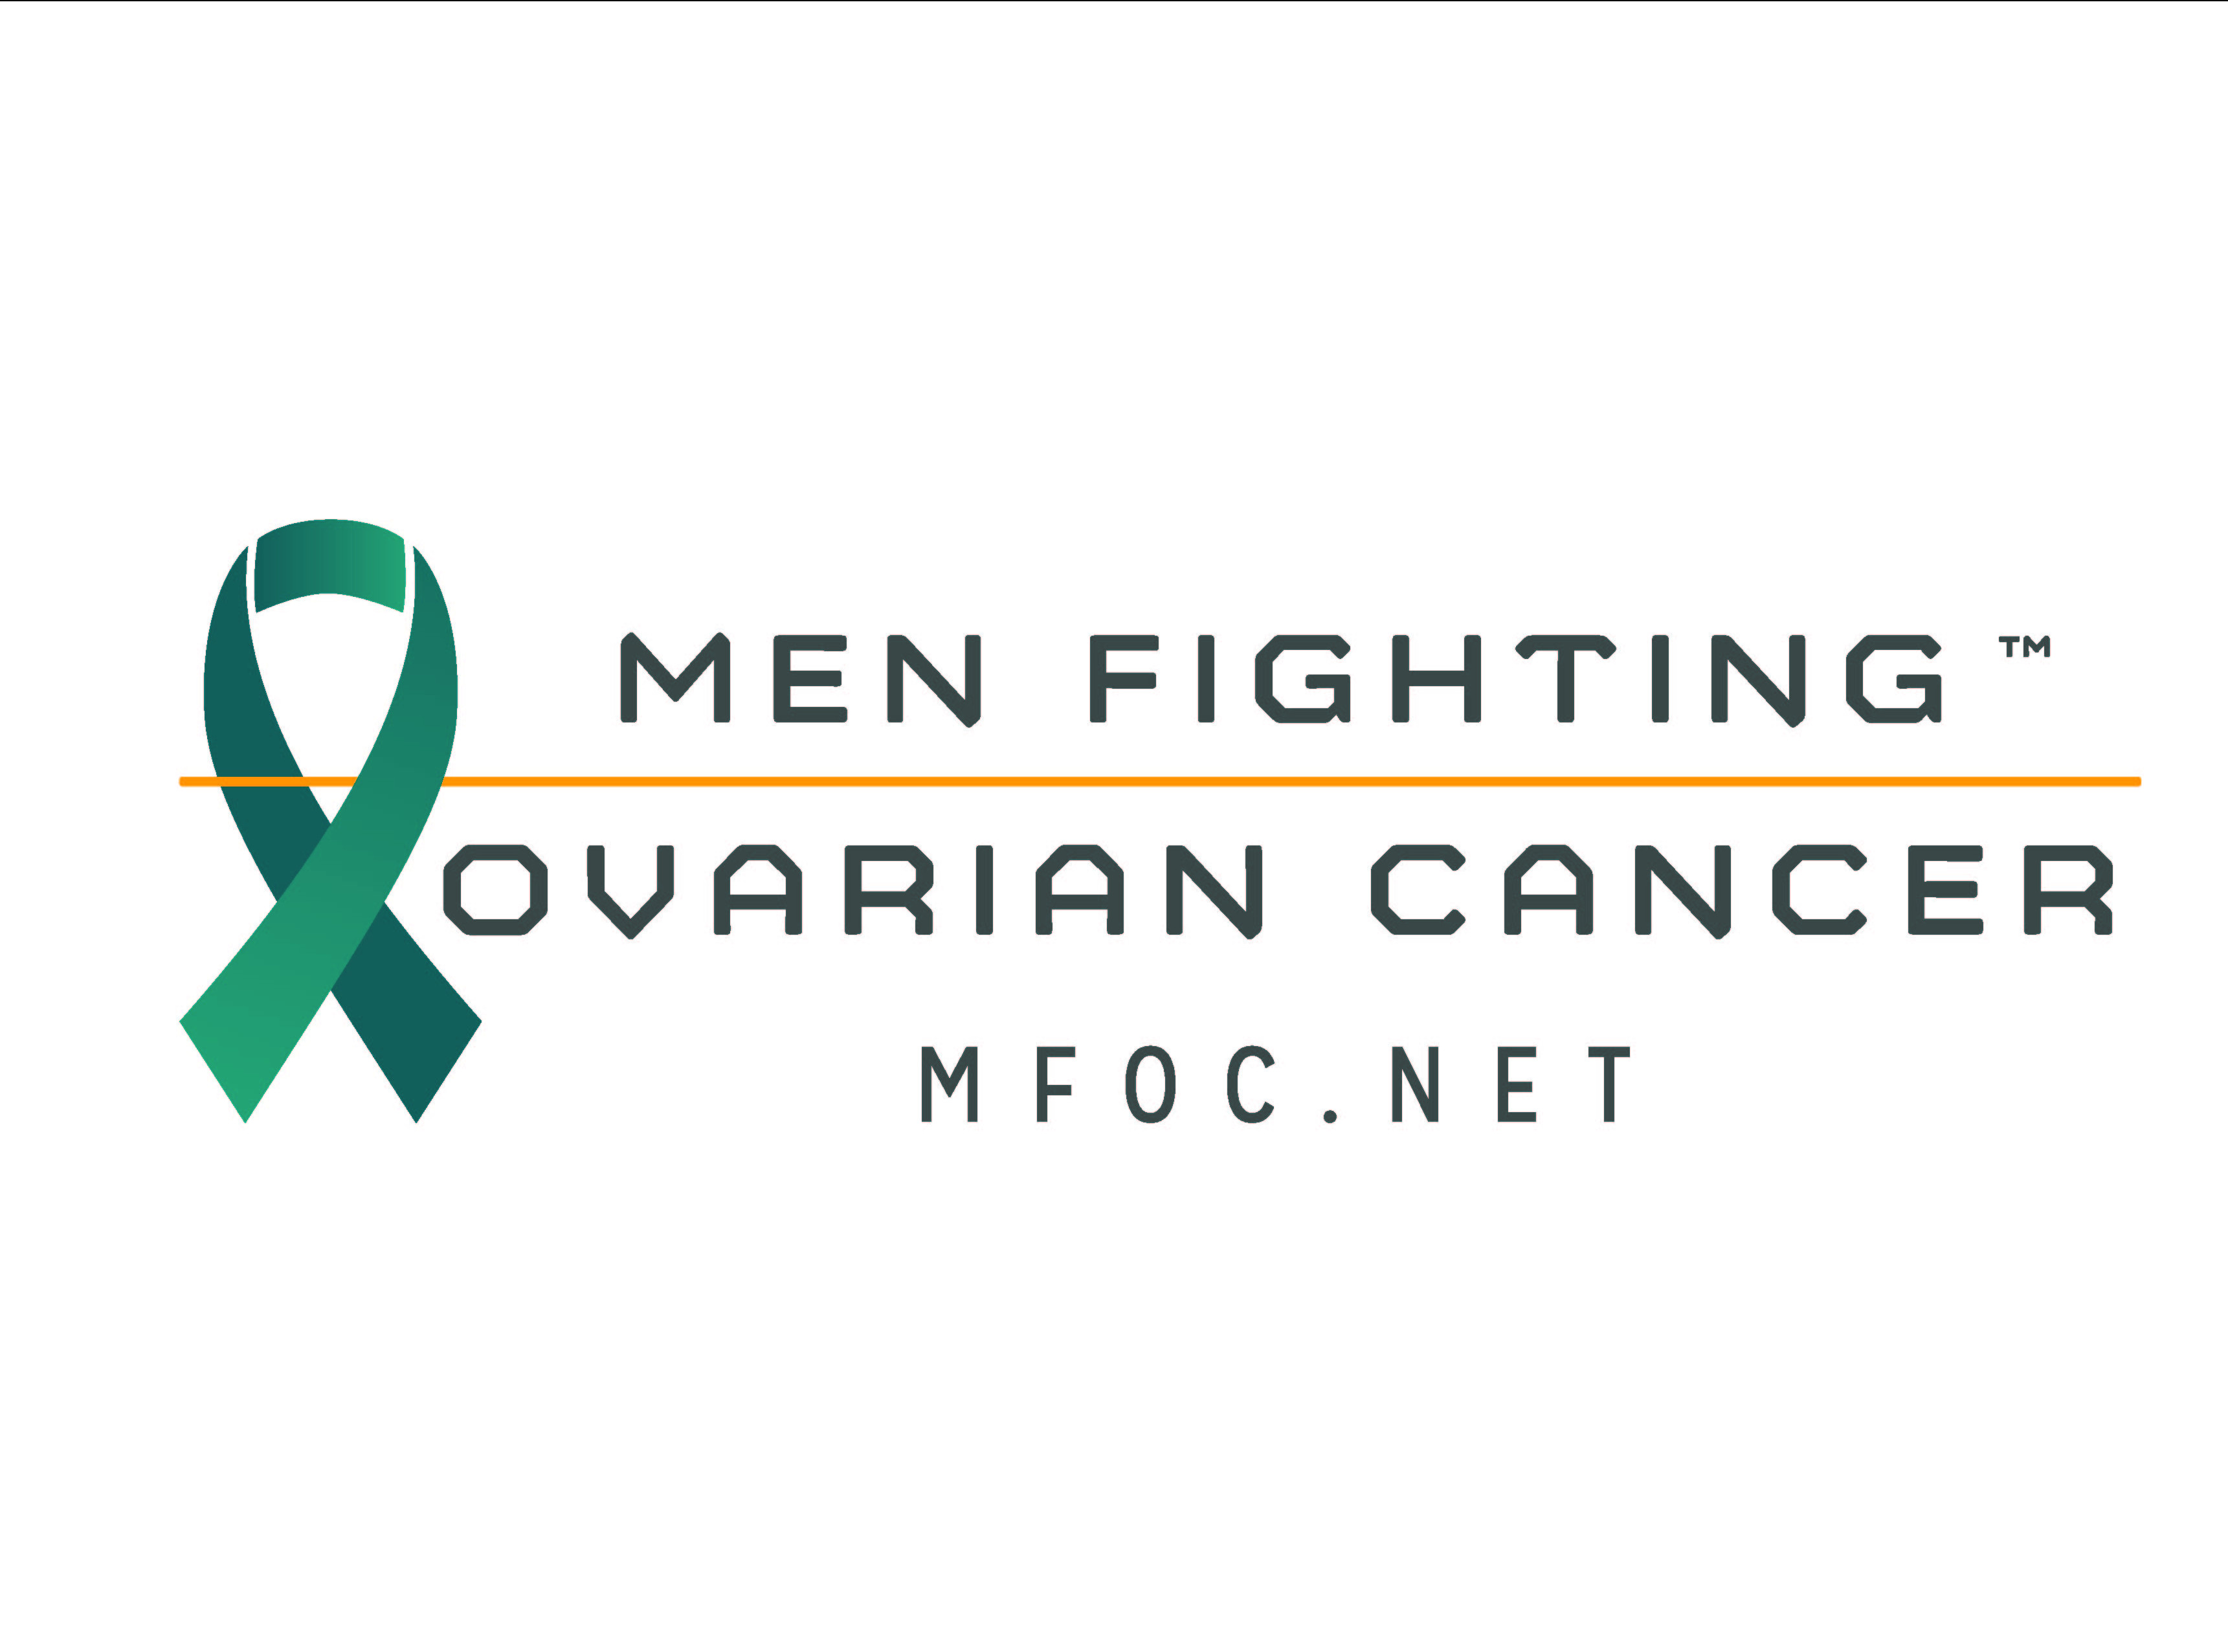 Men Fighting Ovarian Cancer